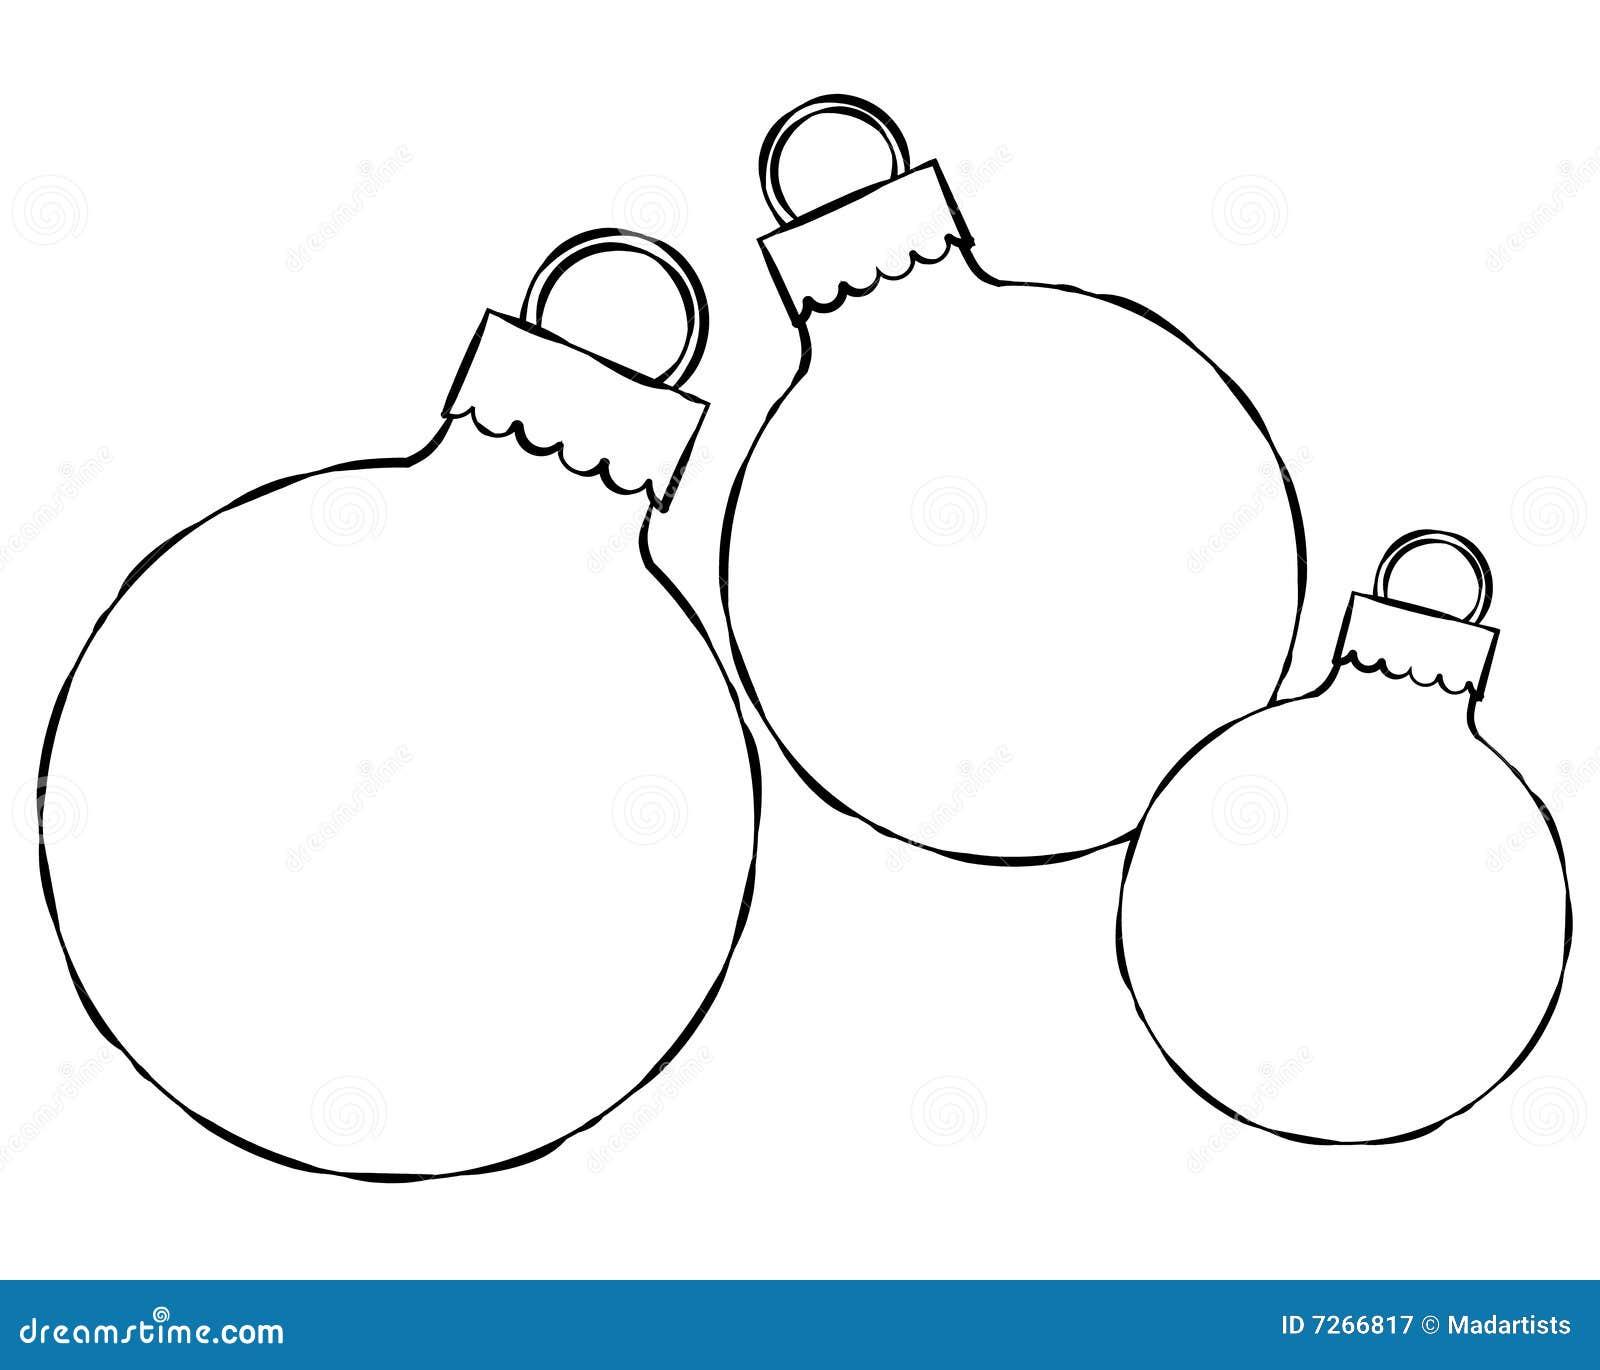 Christmas Ornament Outlines Christmas ornament frame